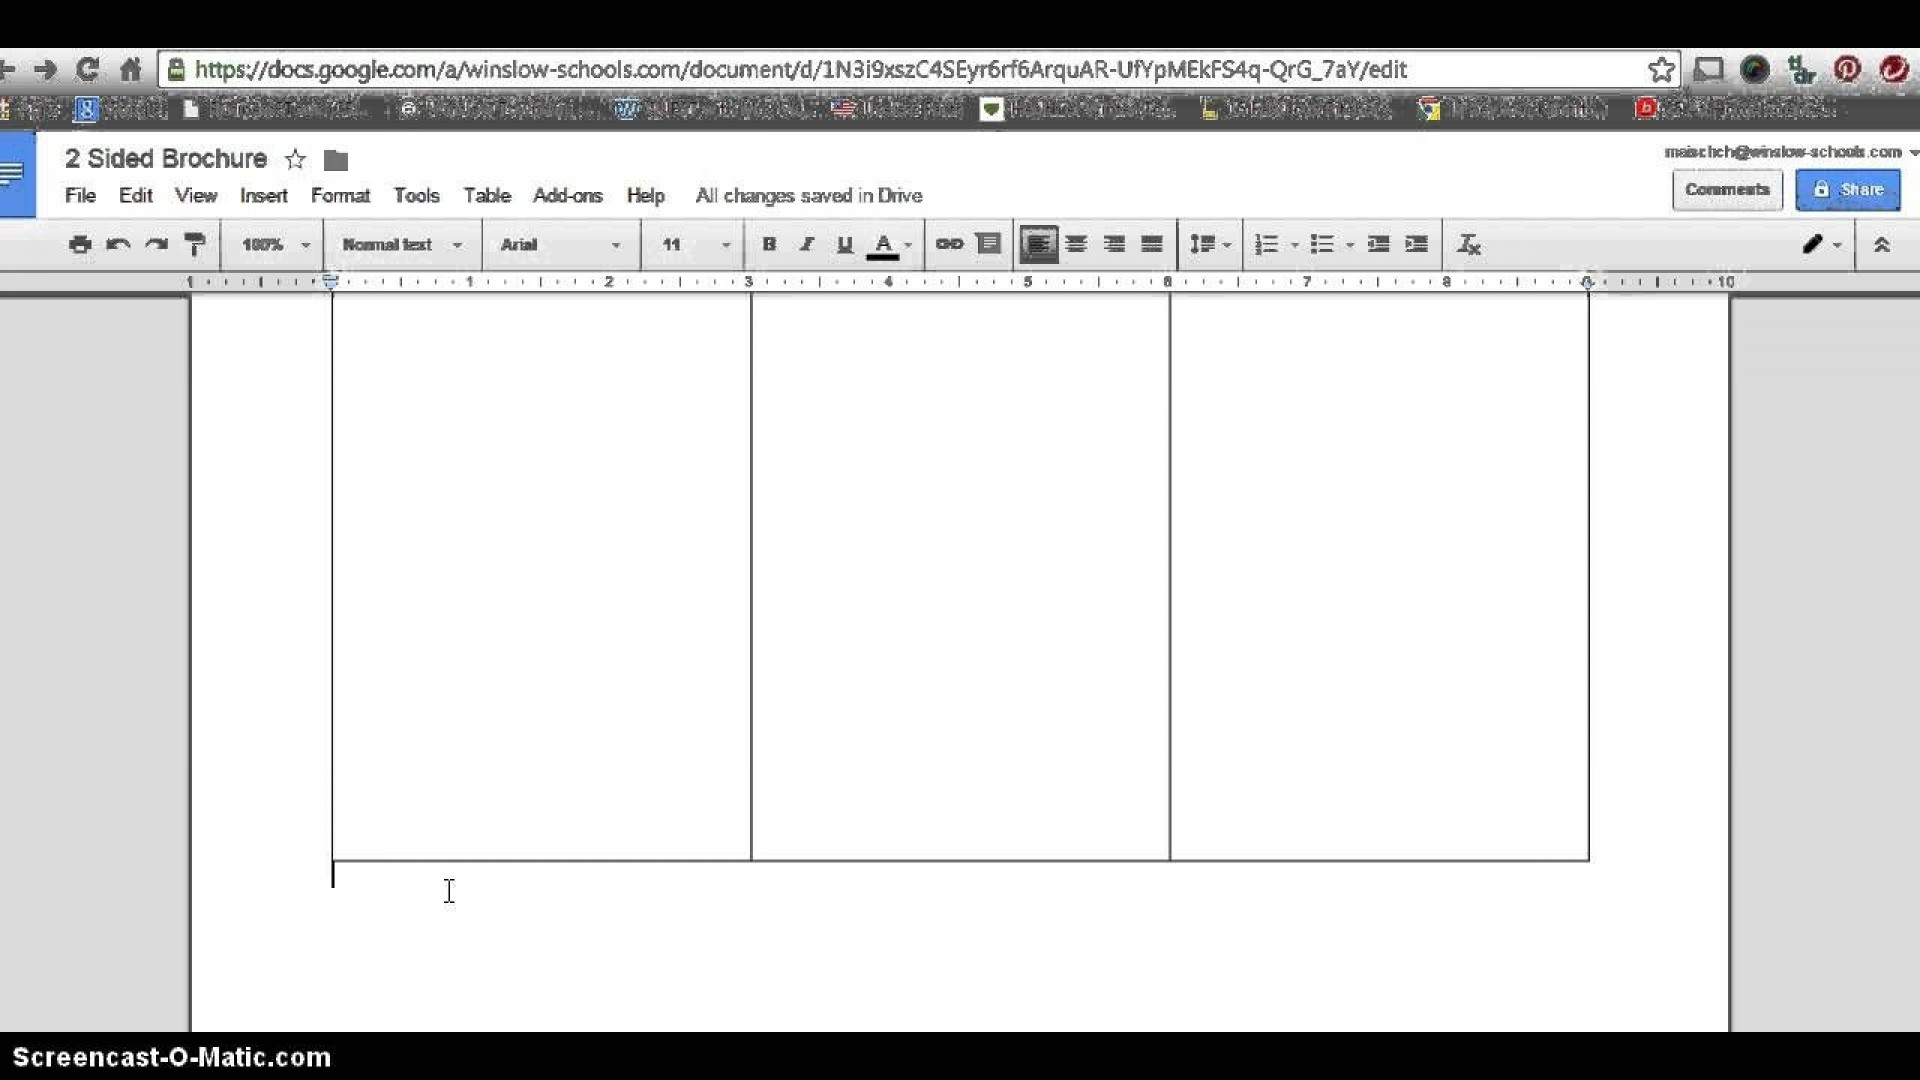 006 Impressive 3 Fold Brochure Template Doc Example  Google1920